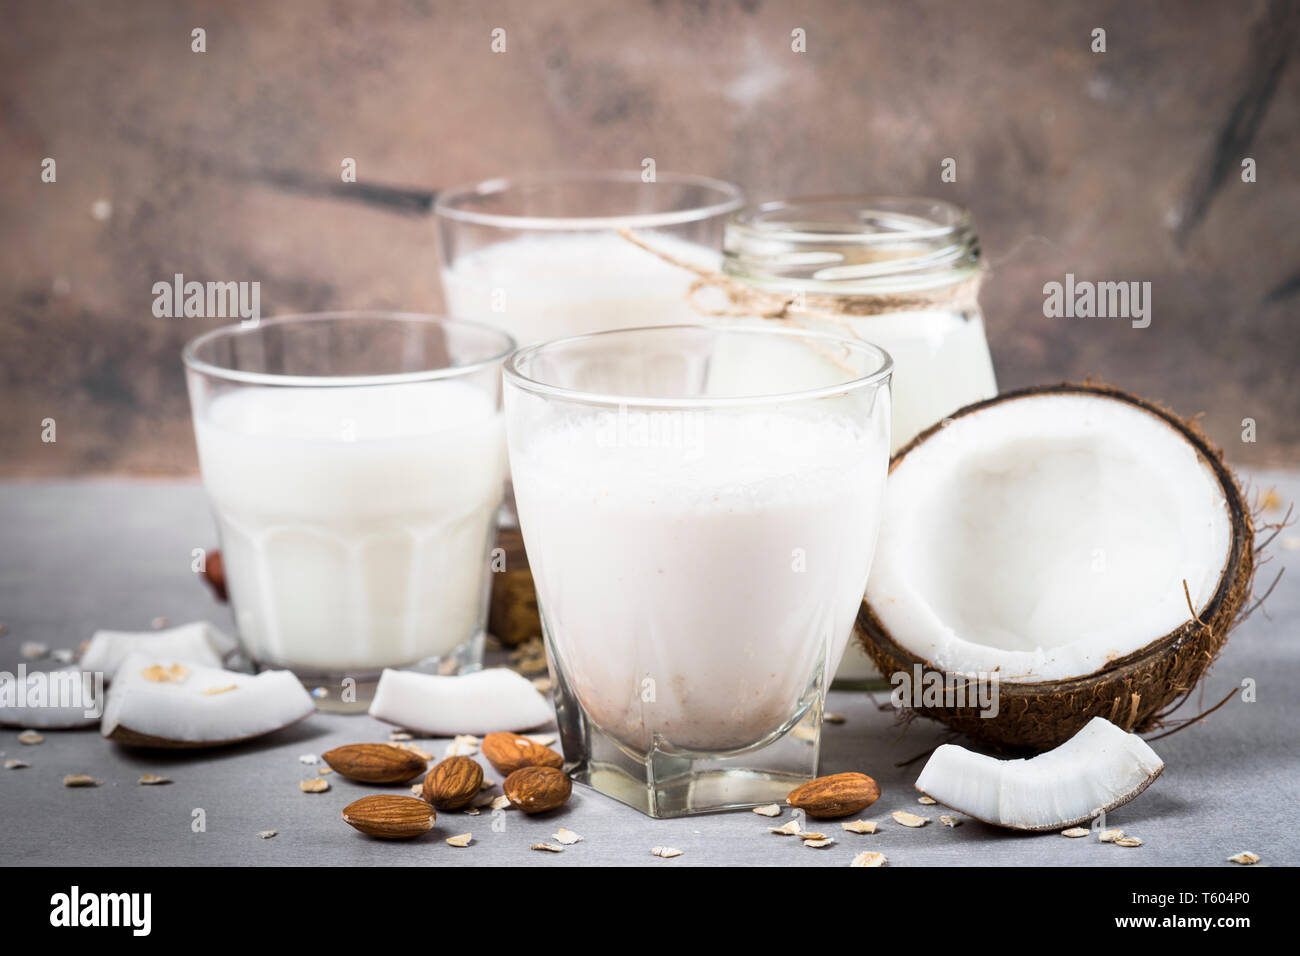 Vegan non dairy alternative milk.  - Stock Image